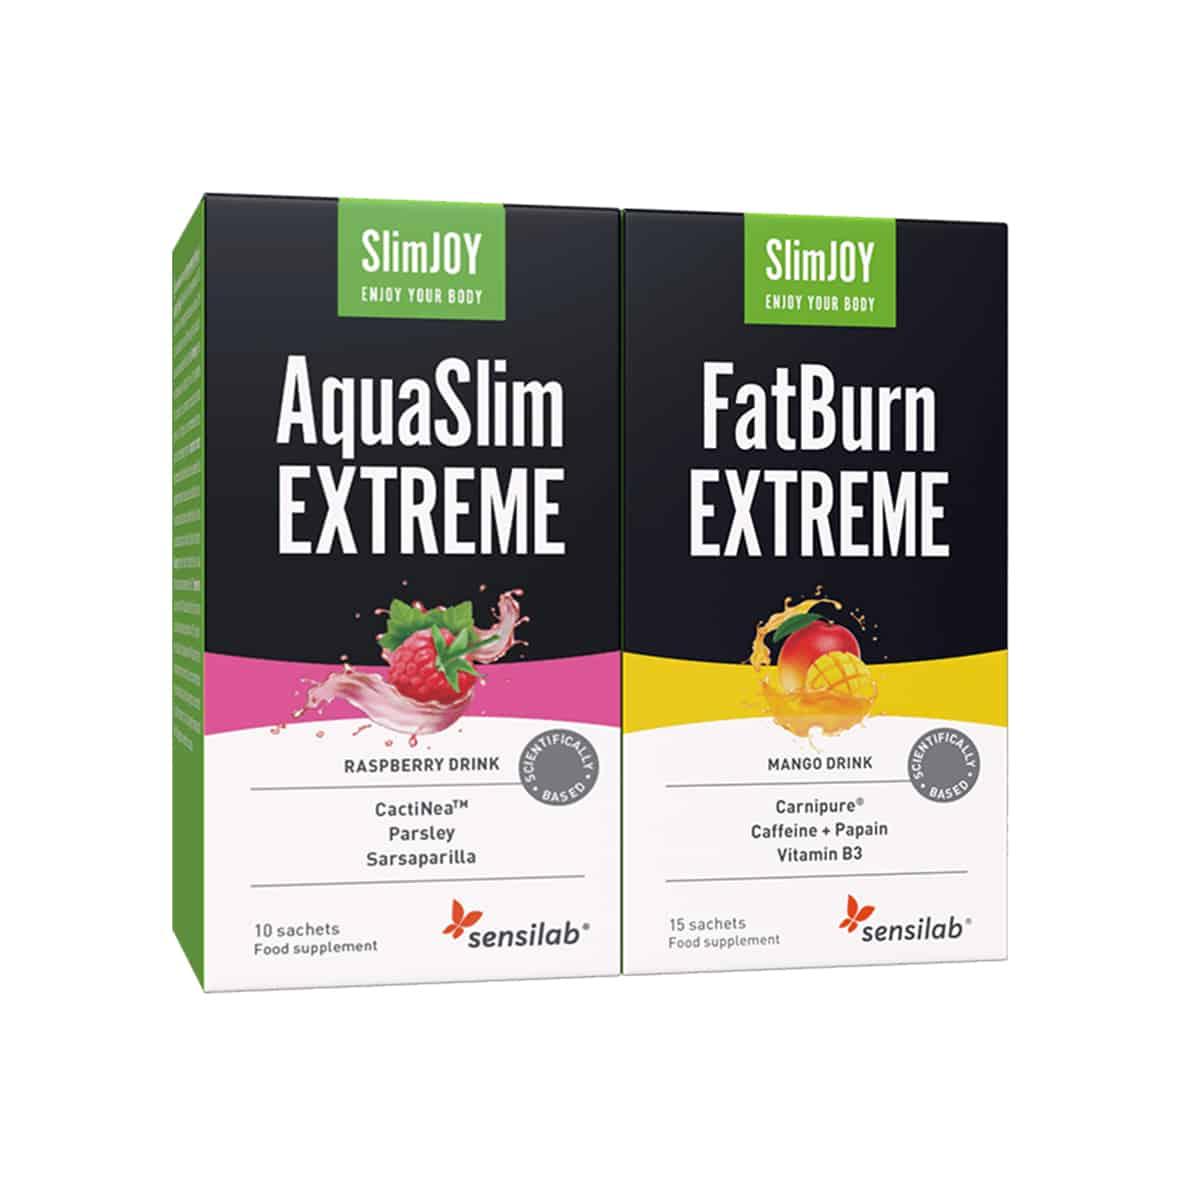 SlimJOY Build Muscle Fast Ireland AquaSlim FatBurn Weight Loss